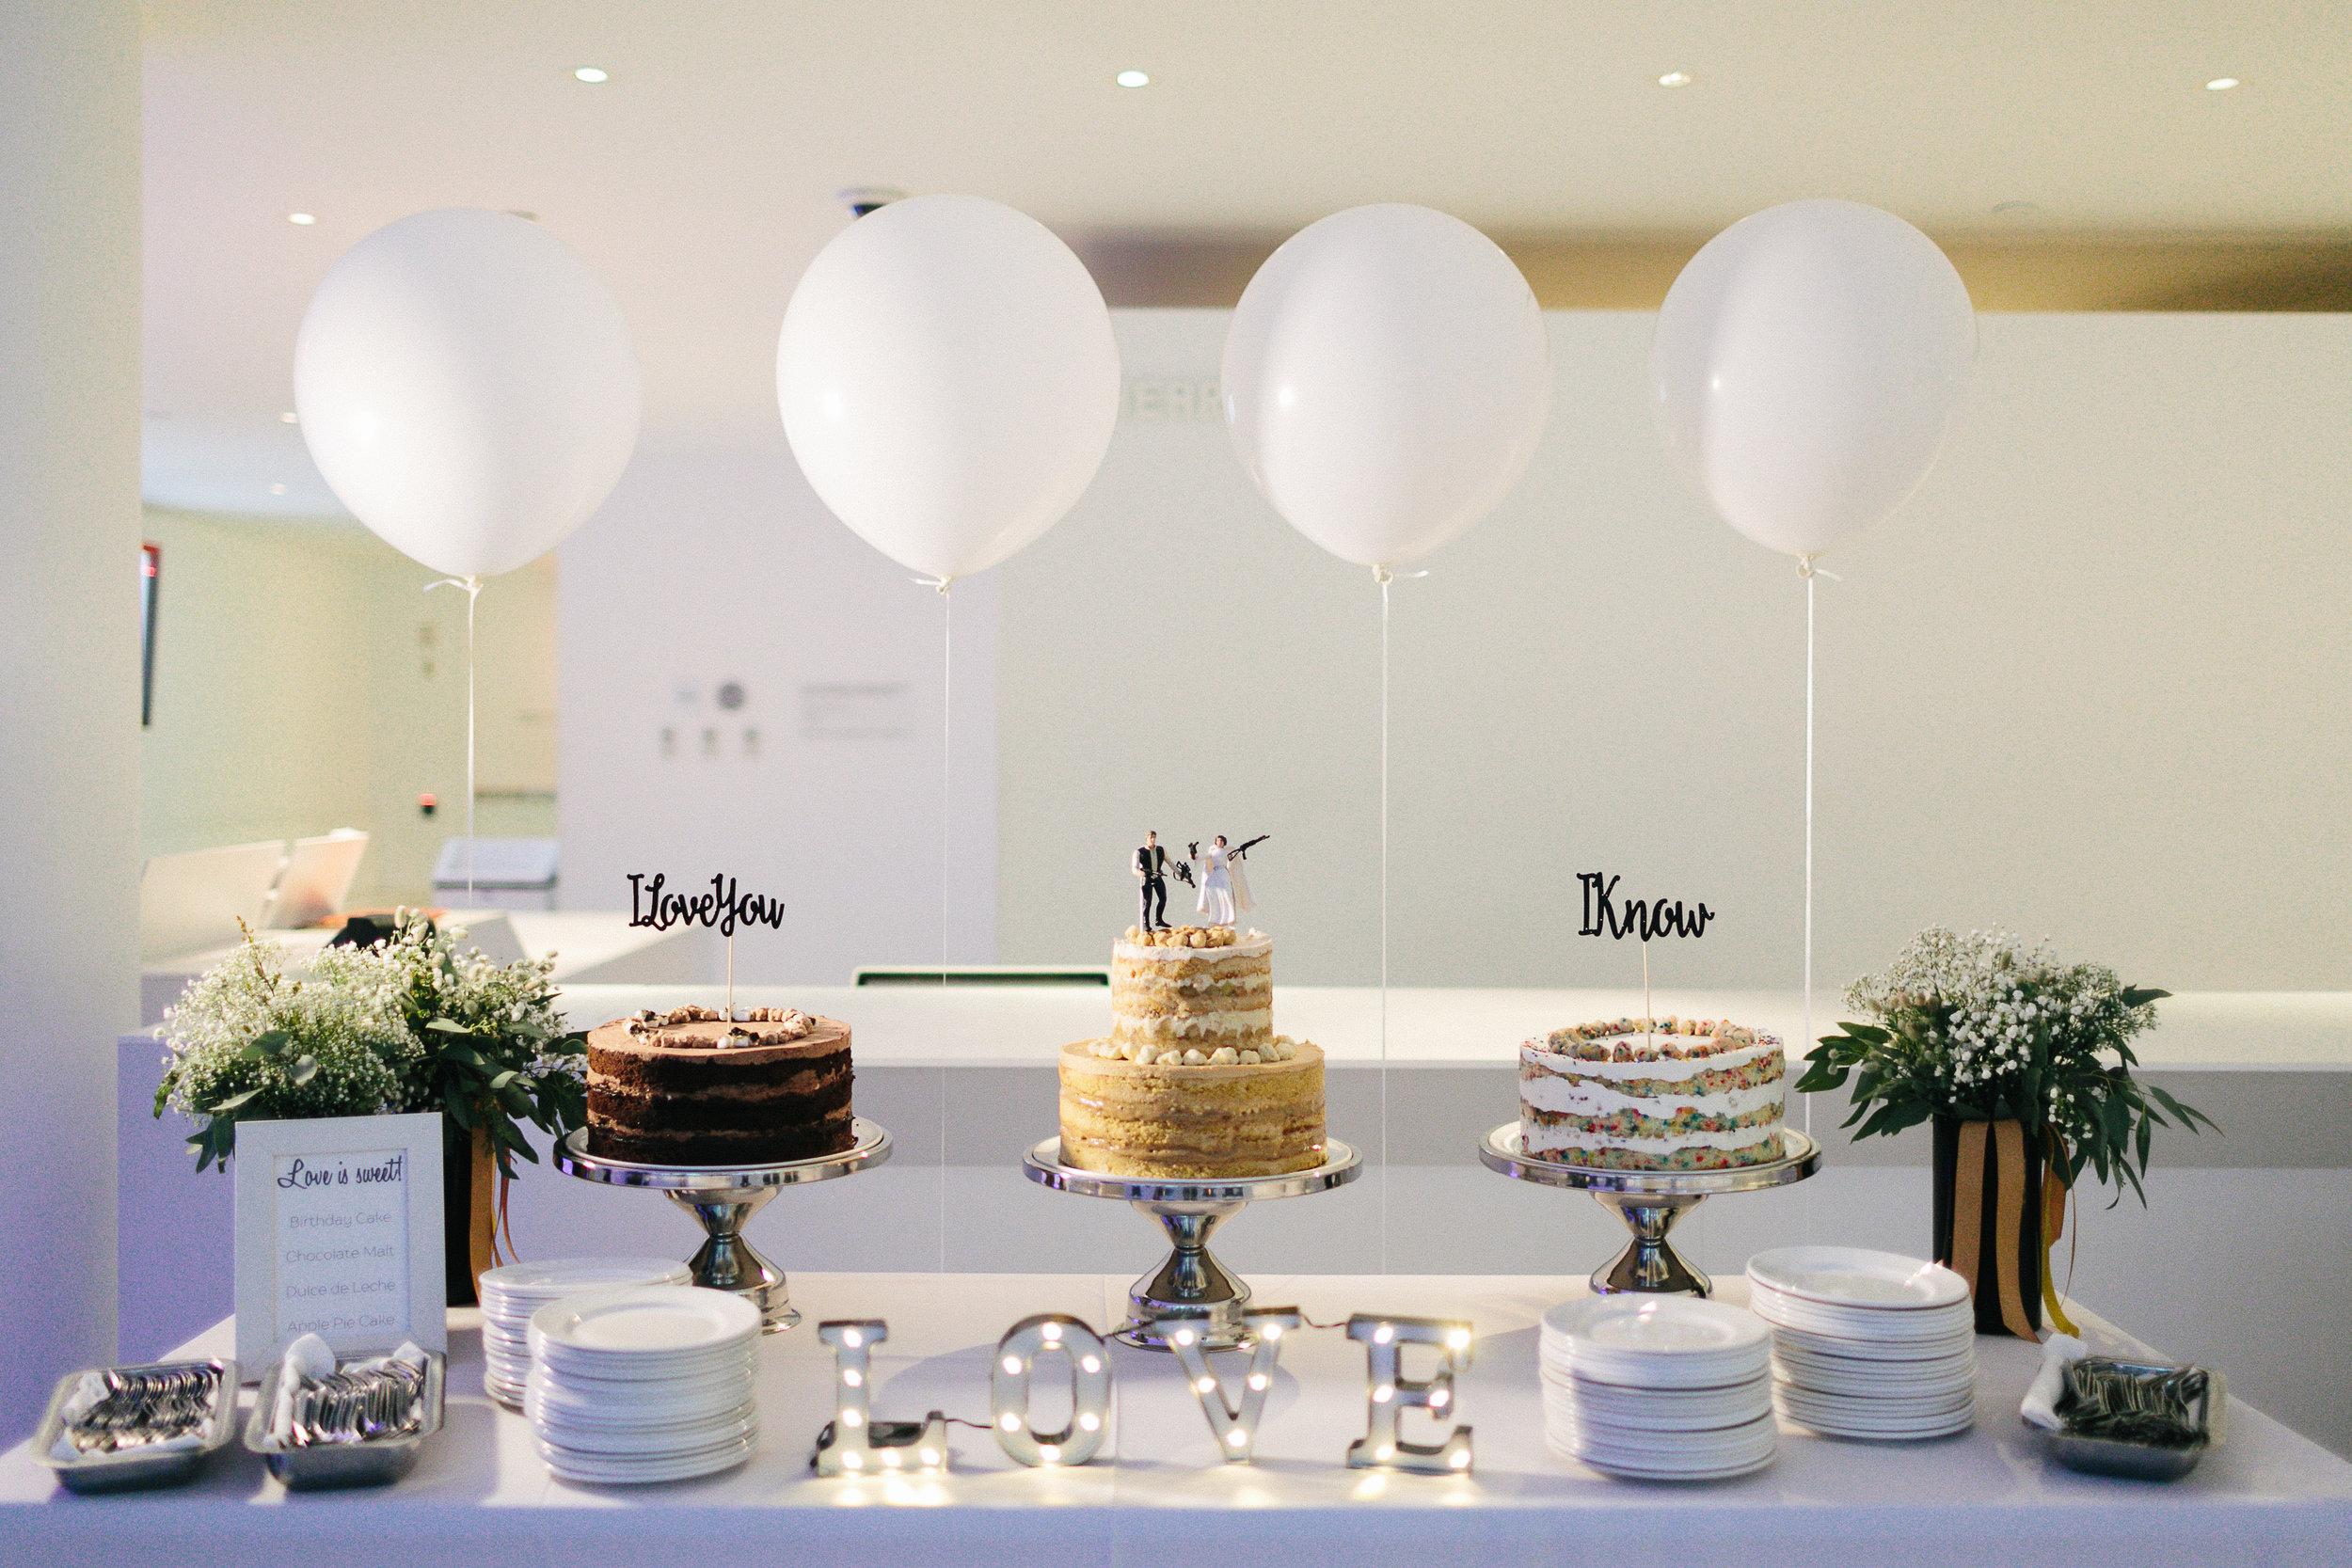 the knot - a movie-themed wedding in long island city, ny